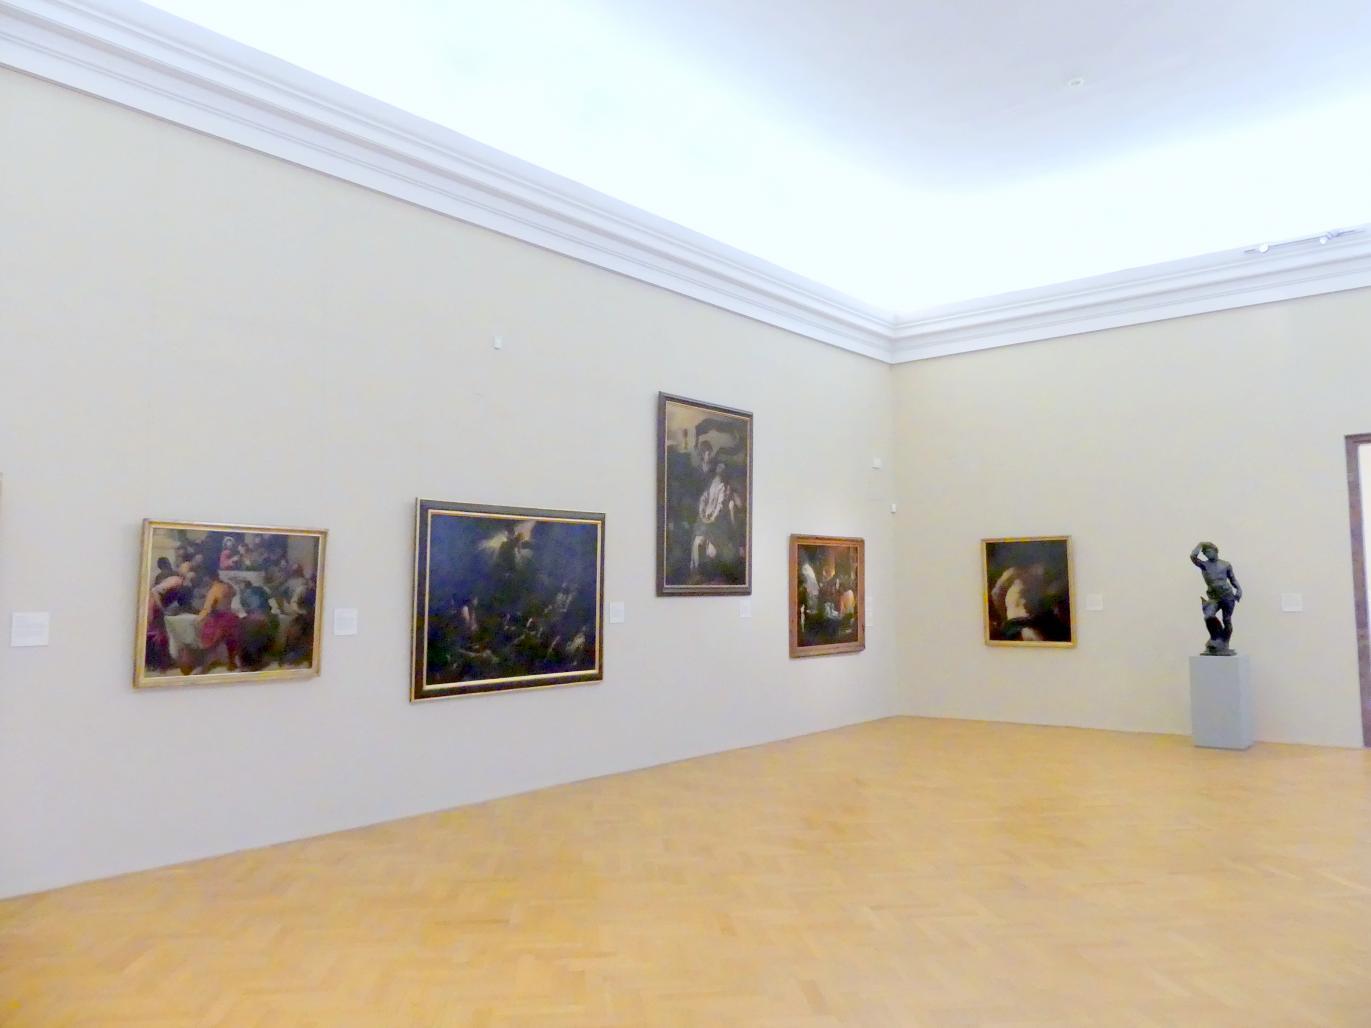 Prag, Nationalgalerie im Palais Sternberg, 2. Obergeschoss, Saal 6, Bild 3/4